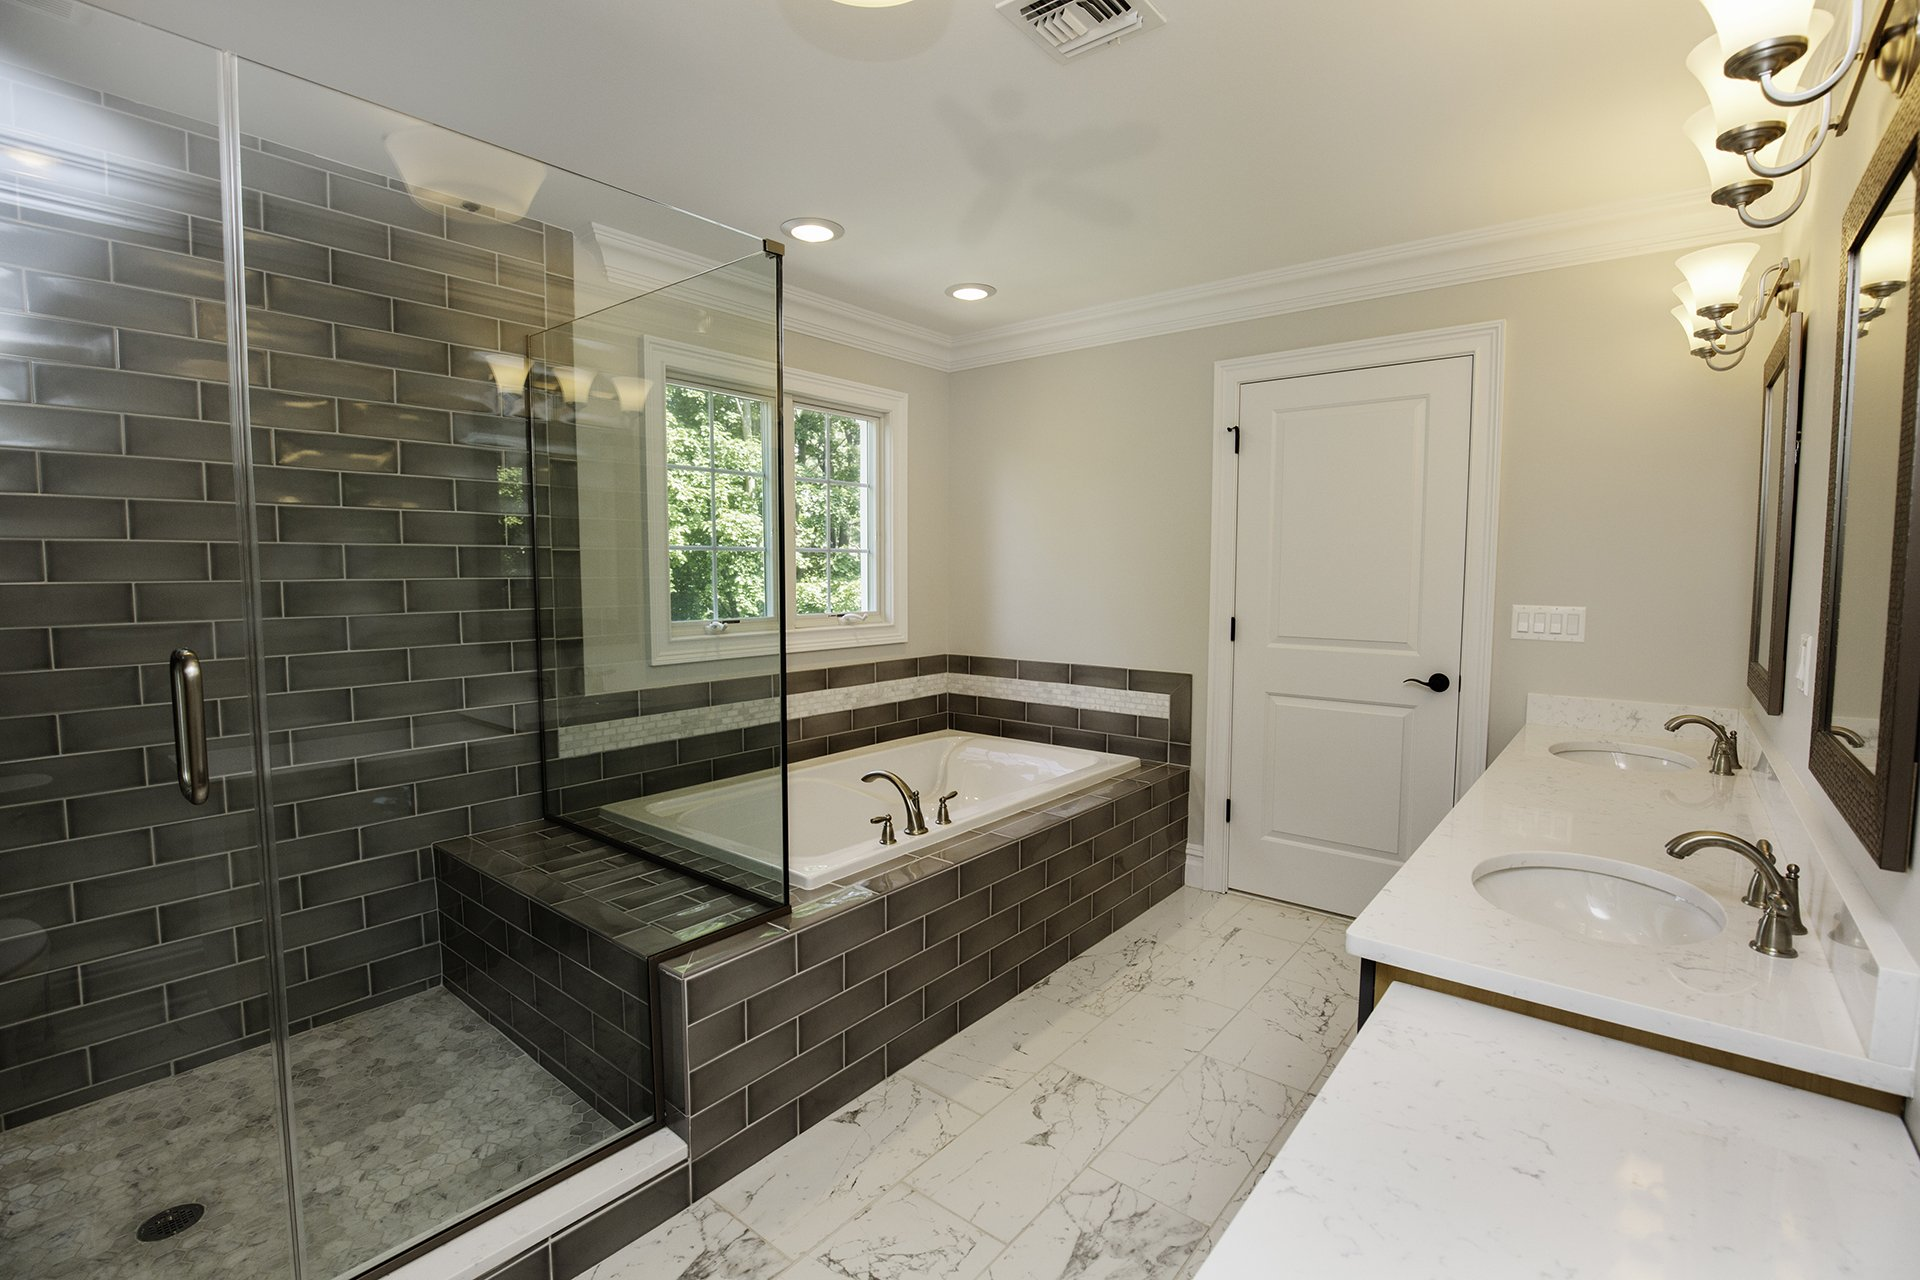 Bathroom Trends 2017 28+ [ bathroom trends for 2017 ] | home renovation trends for 2016